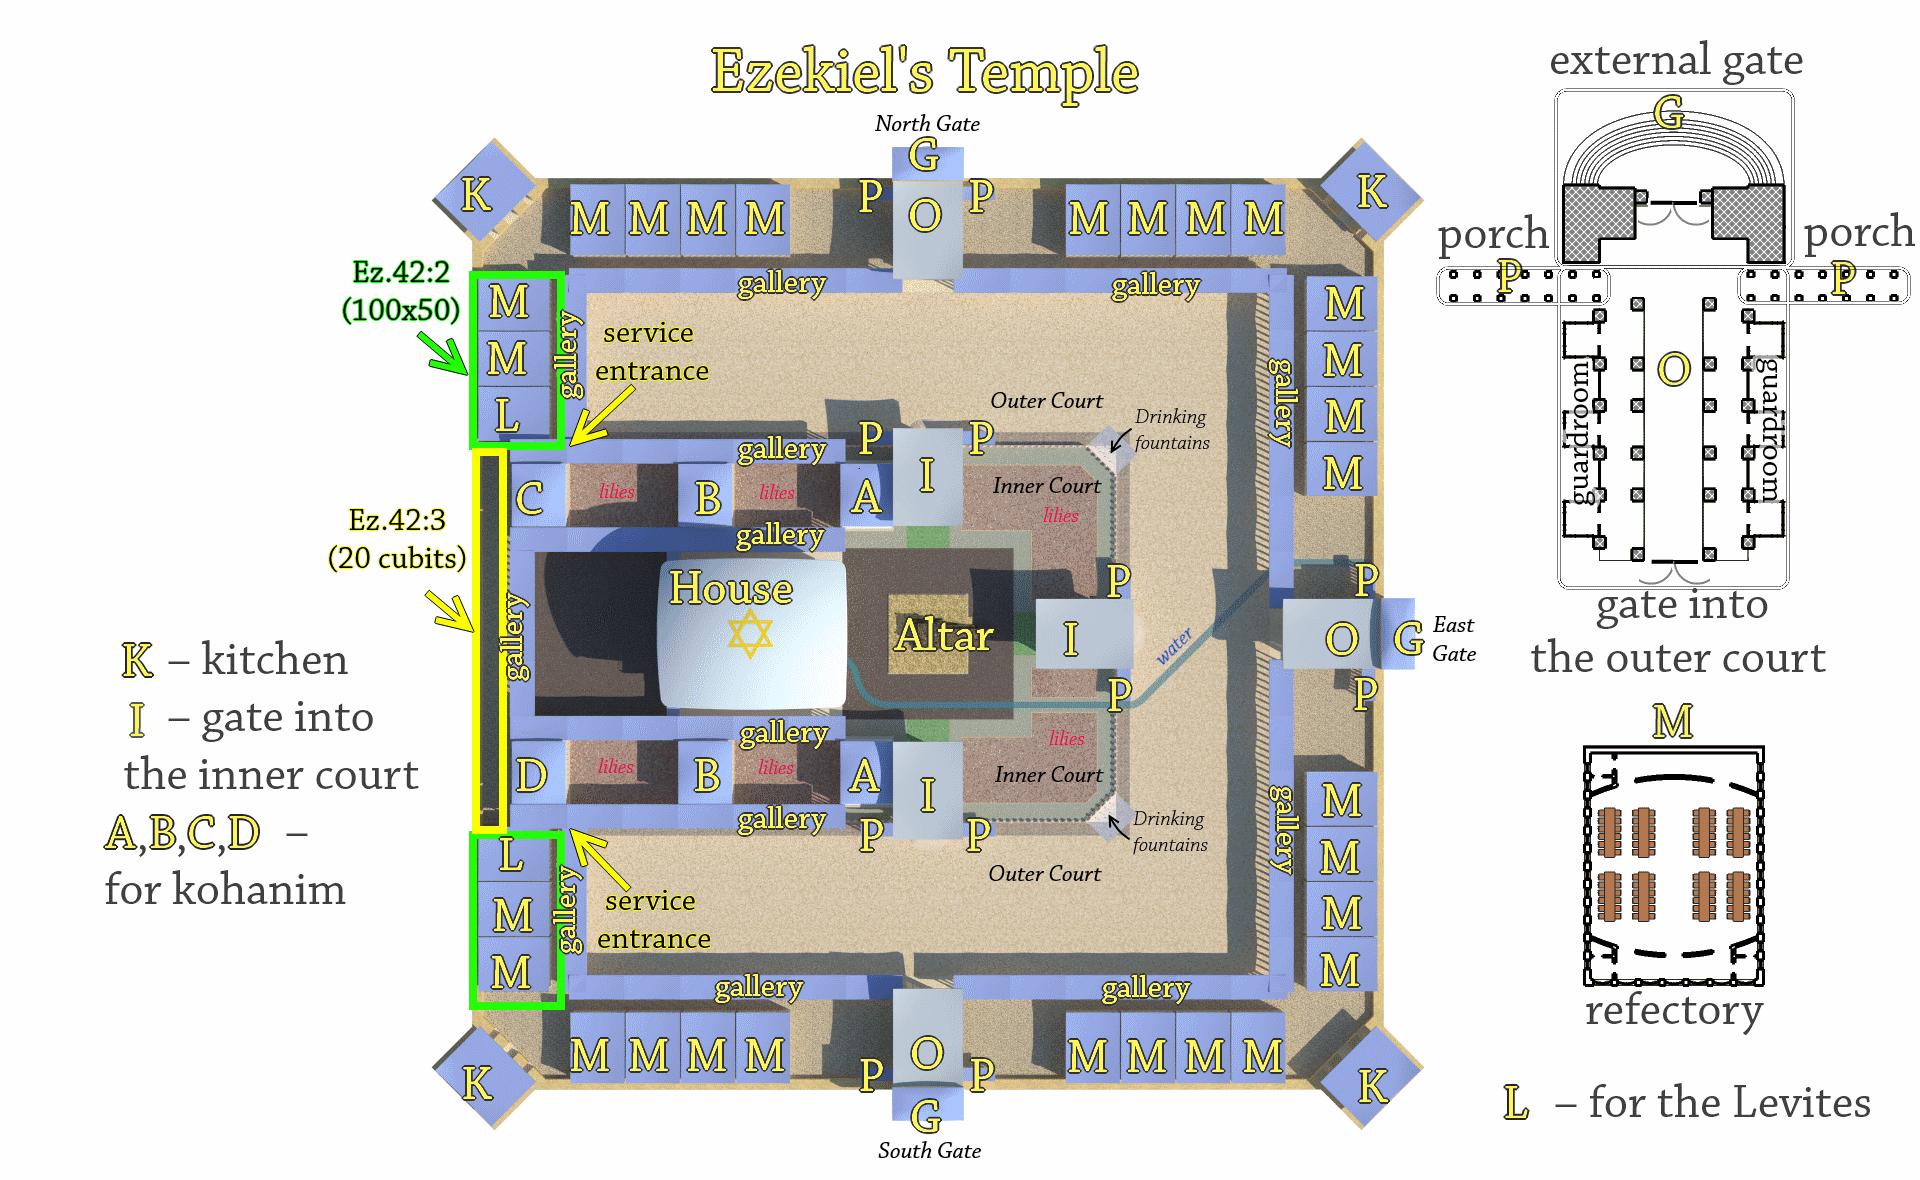 Ezekiel s Temple will be the Third Temple of Israel  Ezekiel s Temple